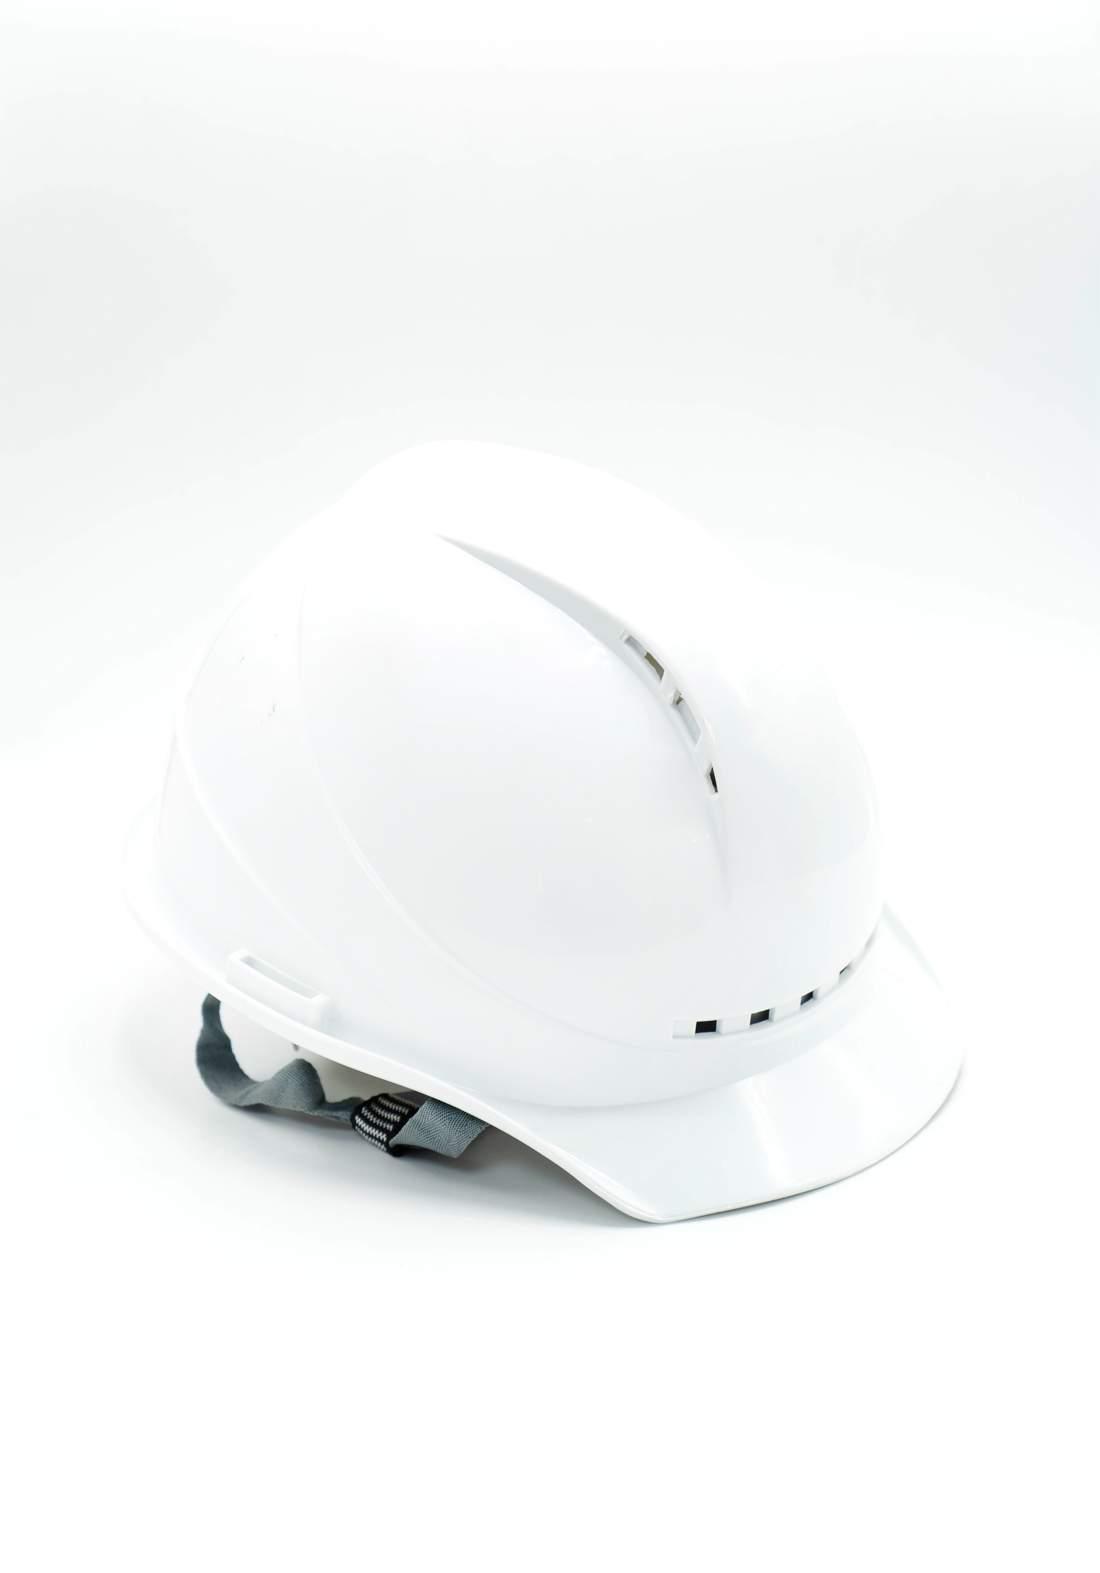 Subul Alhurra China fire Helmet Plastic خوذة الحماية البلاستيكية